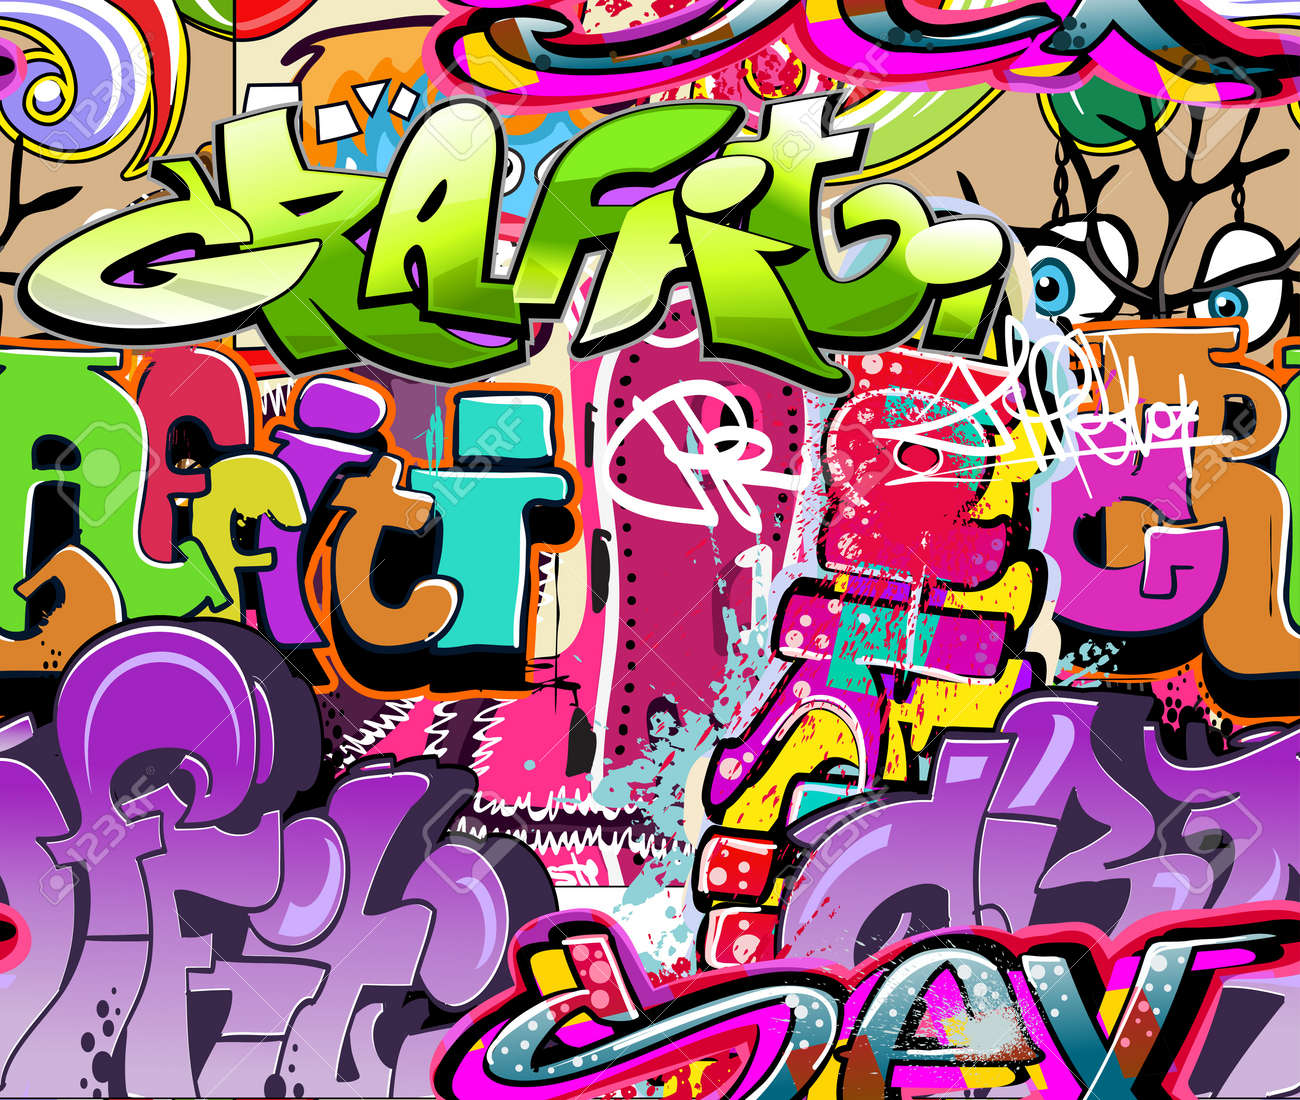 Graffiti wall vector free - Graffiti Wall Graffiti Wall Urban Art Vector Background Seamless Hip Hop Texture Illustration